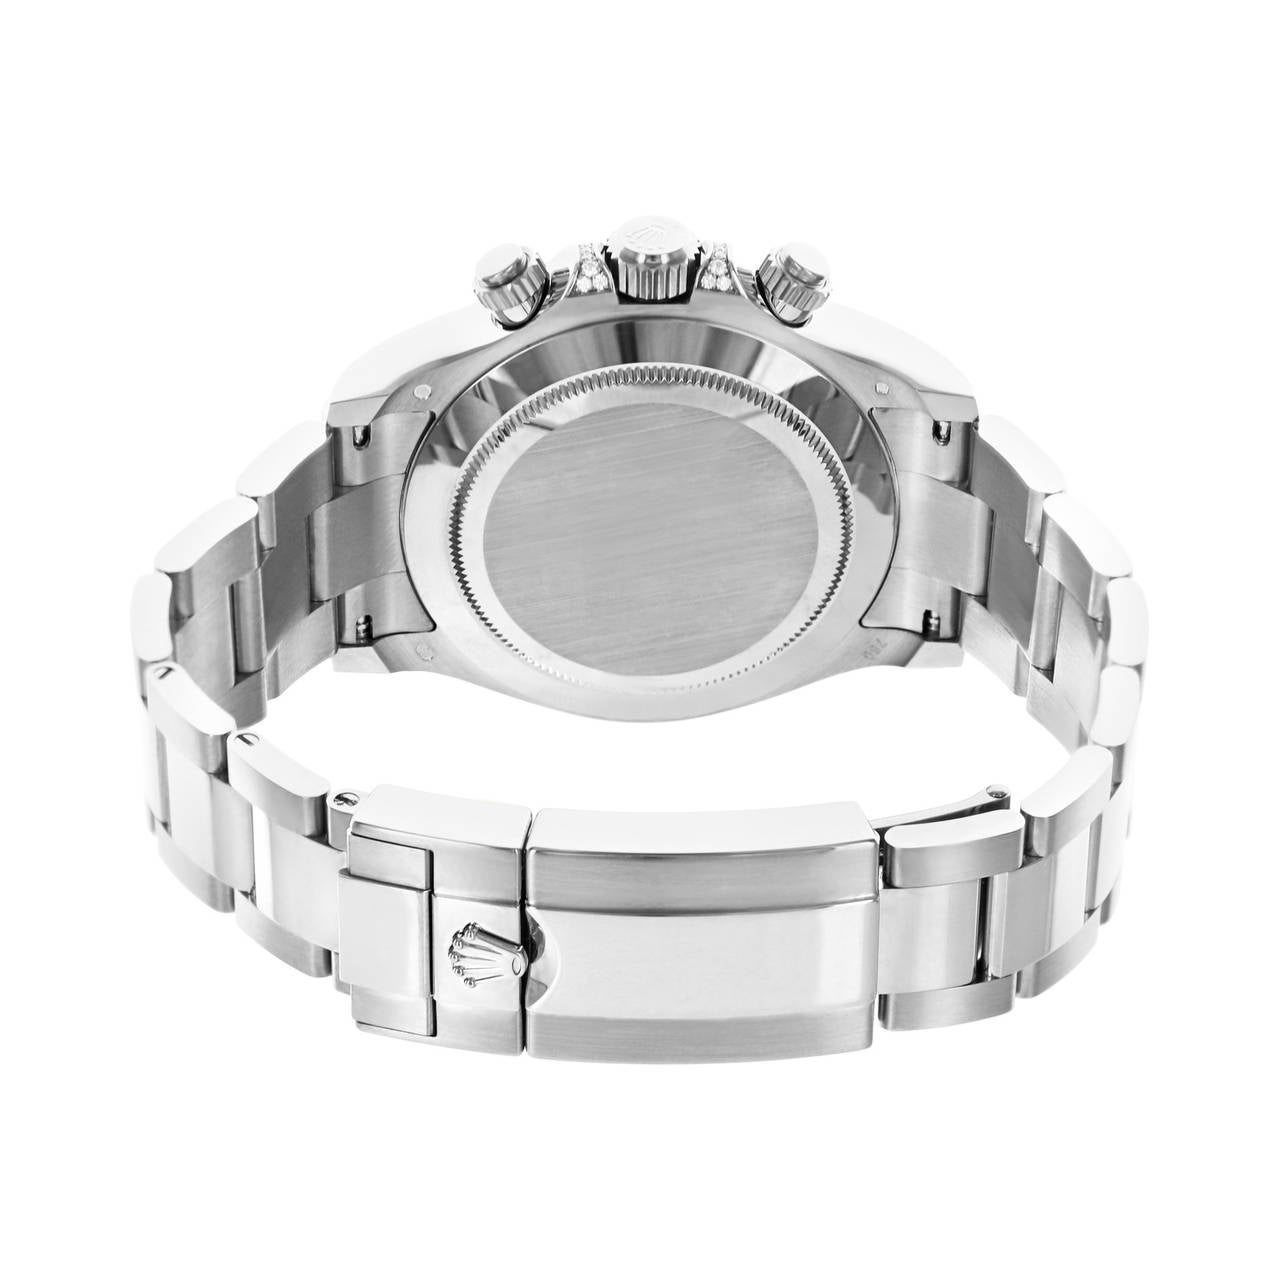 Rolex White Gold Daytona Rainbow Chronometer Wristwatch Ref 116599 4